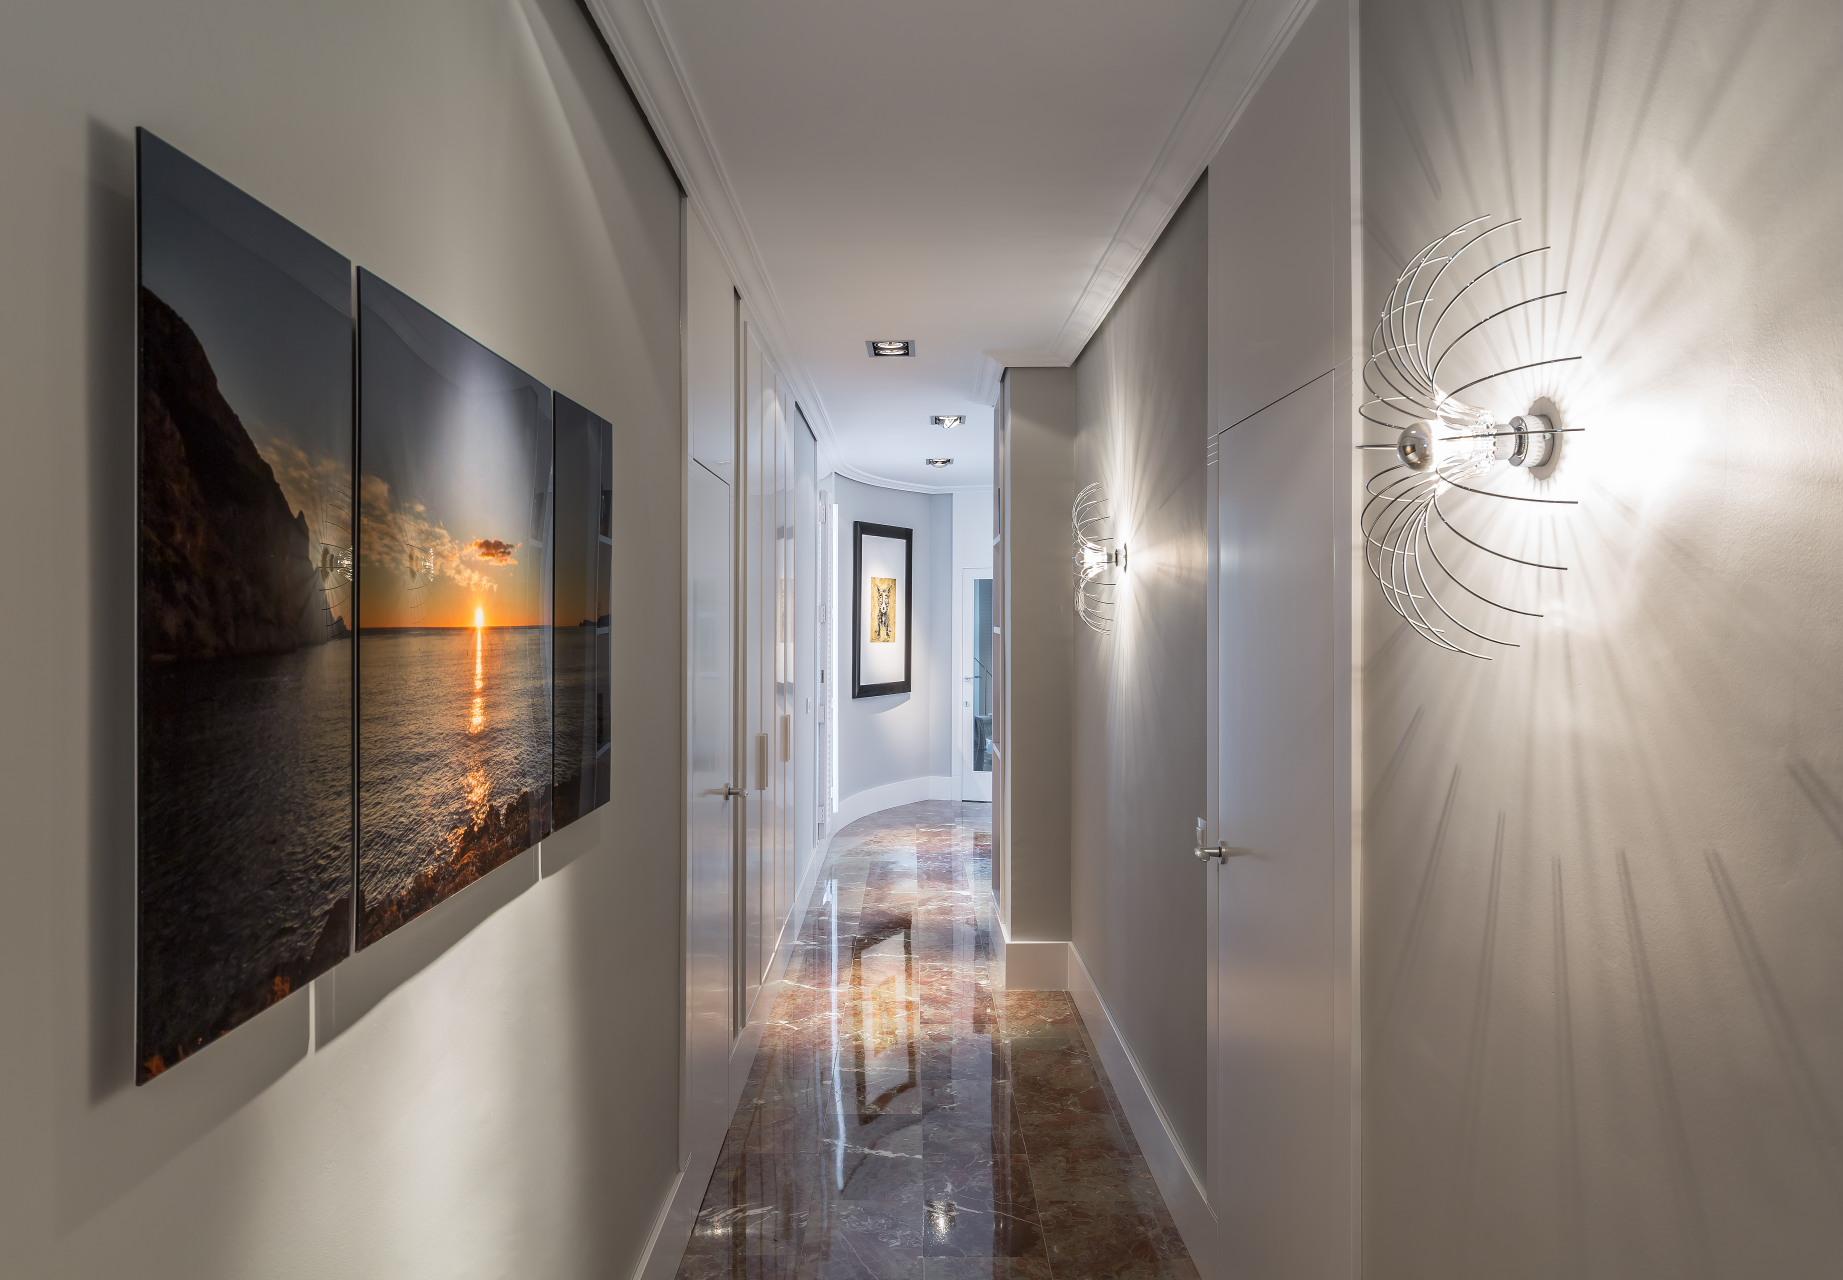 fotografia-arquitectura-interiorismo-valencia-amoros-german-cabo-laura-yerpes (13)